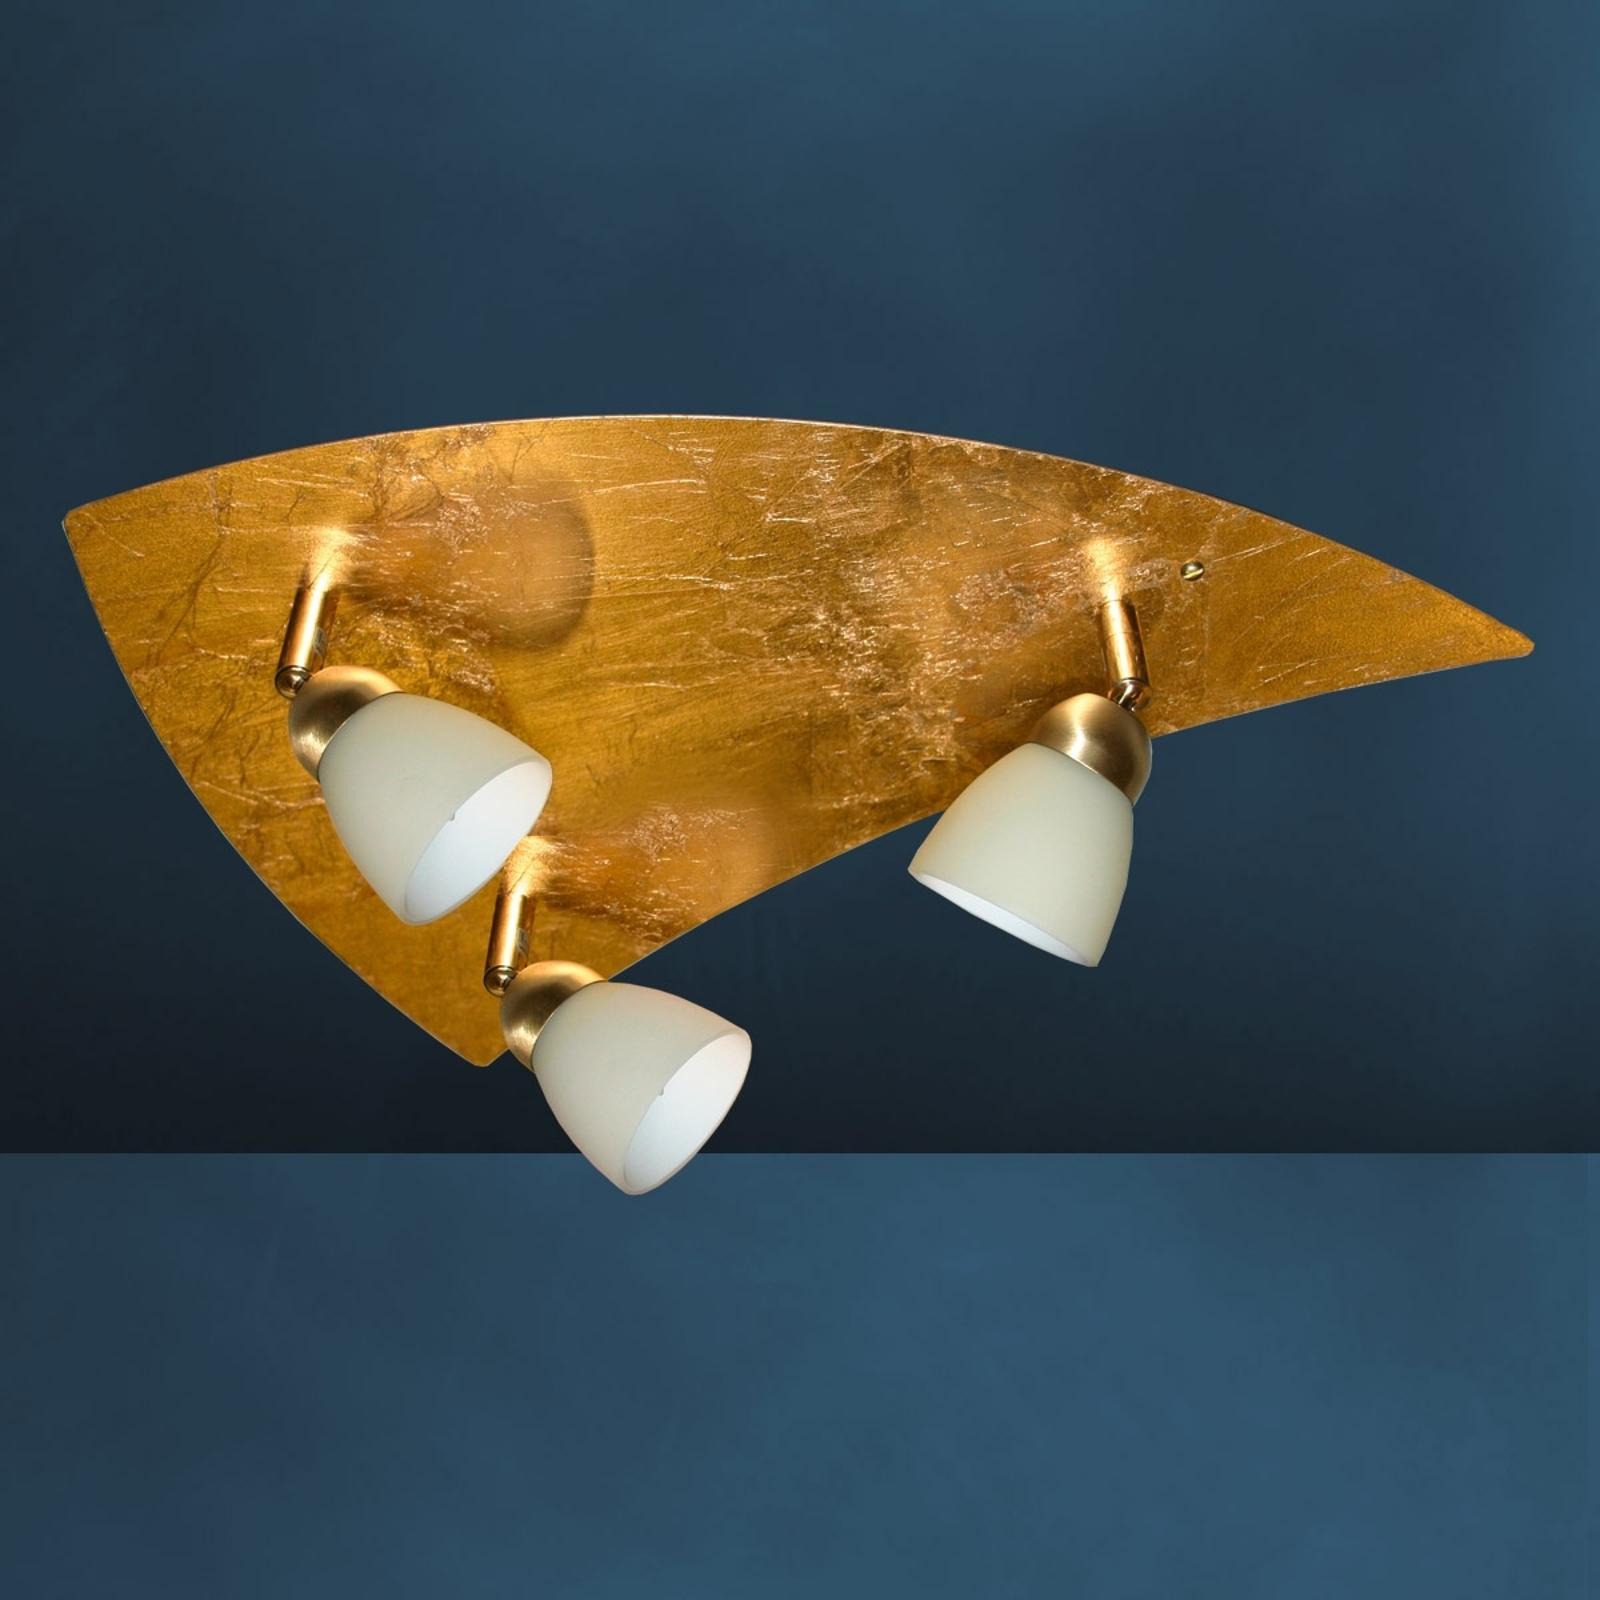 Złota lampa sufitowa ELEGANCE 3-punktowa